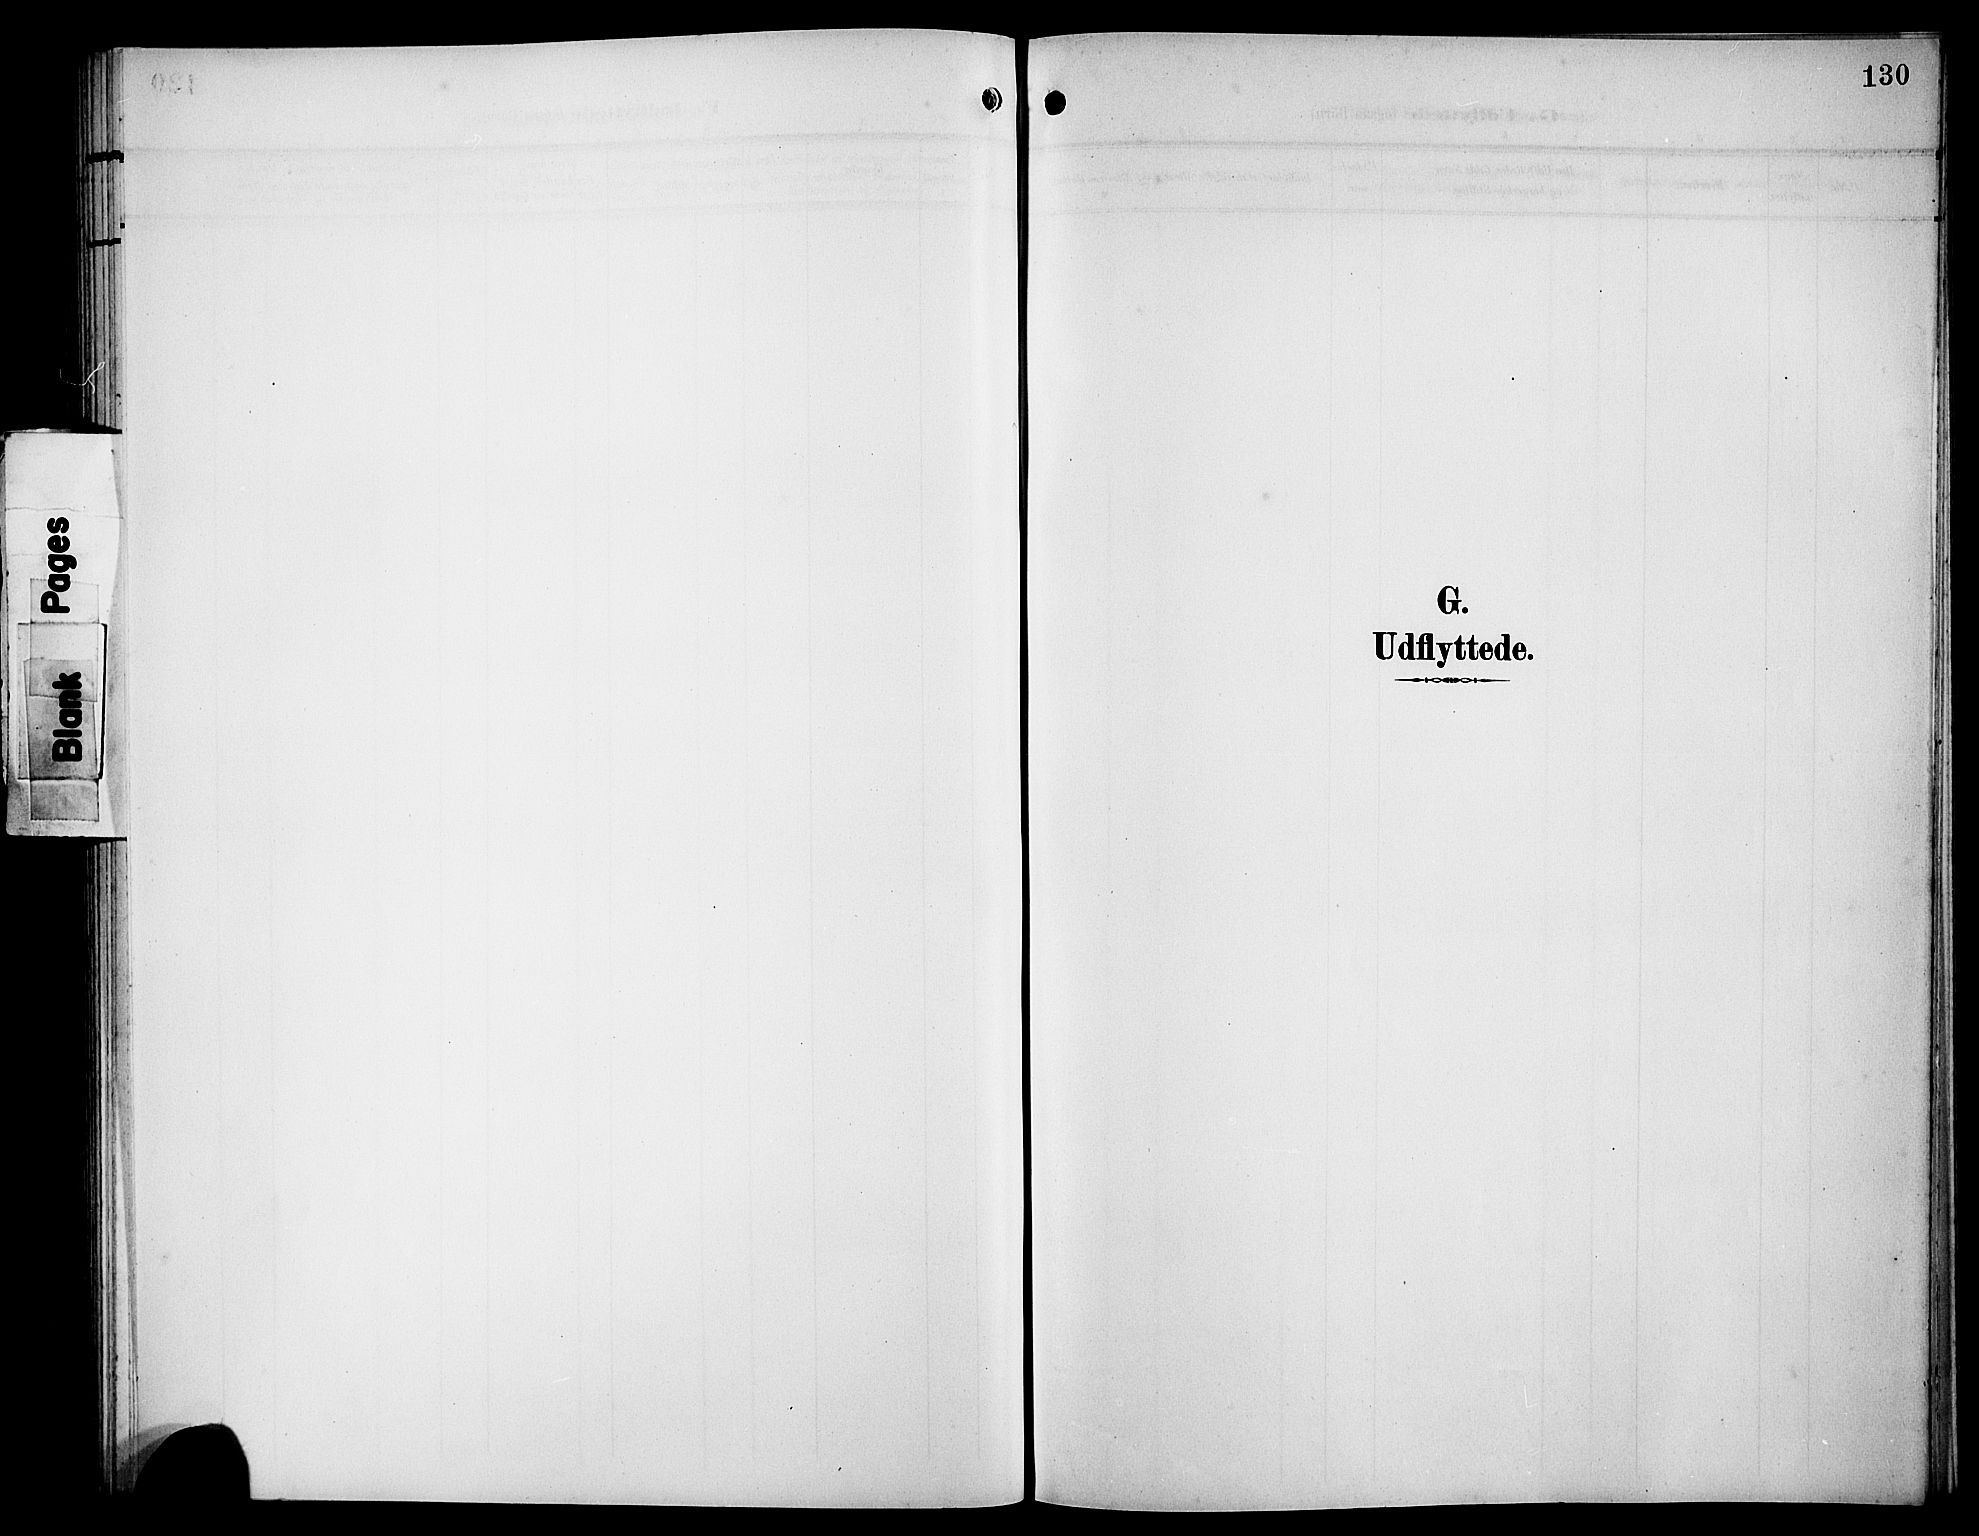 SAB, Bremanger Sokneprestembete, H/Hab: Klokkerbok nr. B 1, 1906-1925, s. 130